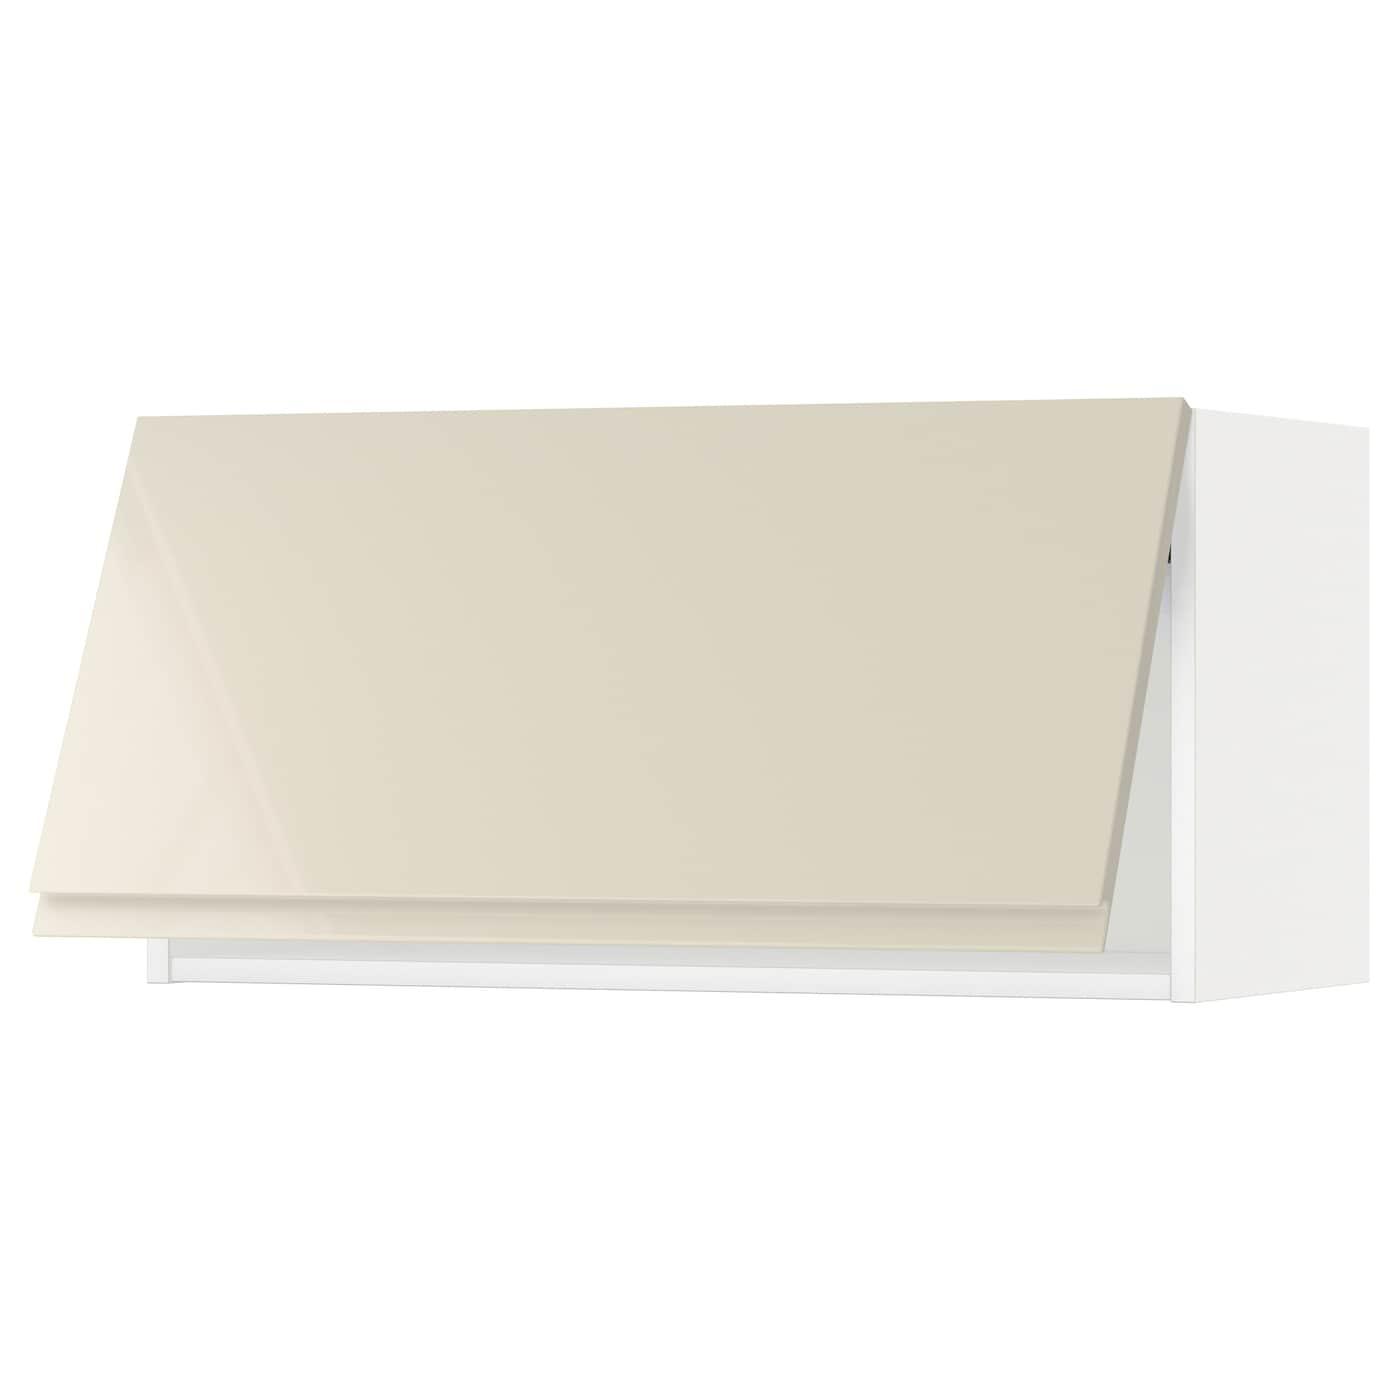 METOD, Wandschrank horizontal, weiß 991.432.36